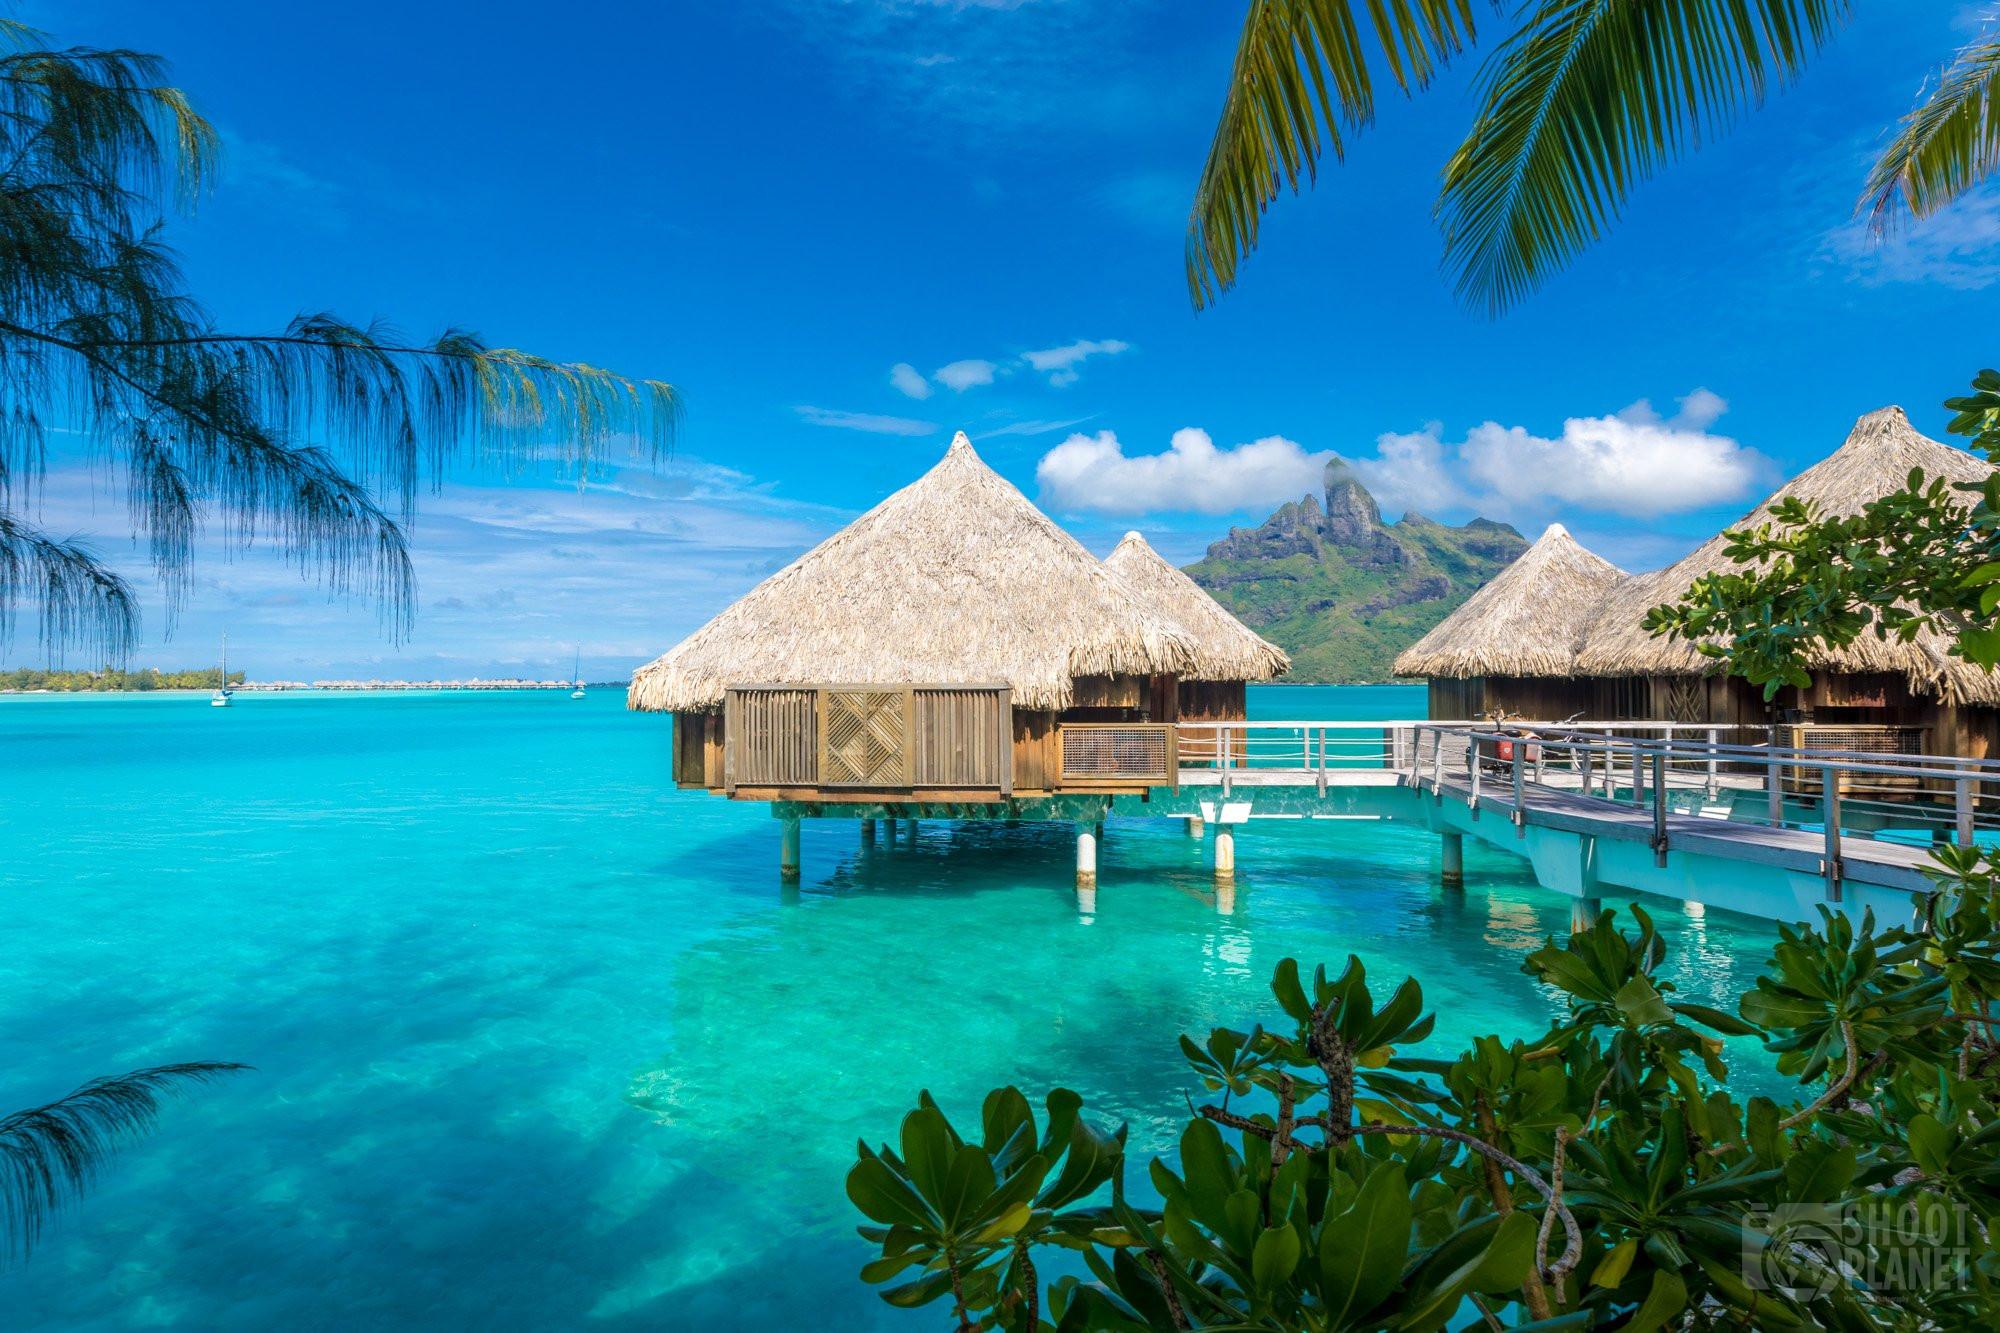 Bora Bora overwater bungallows